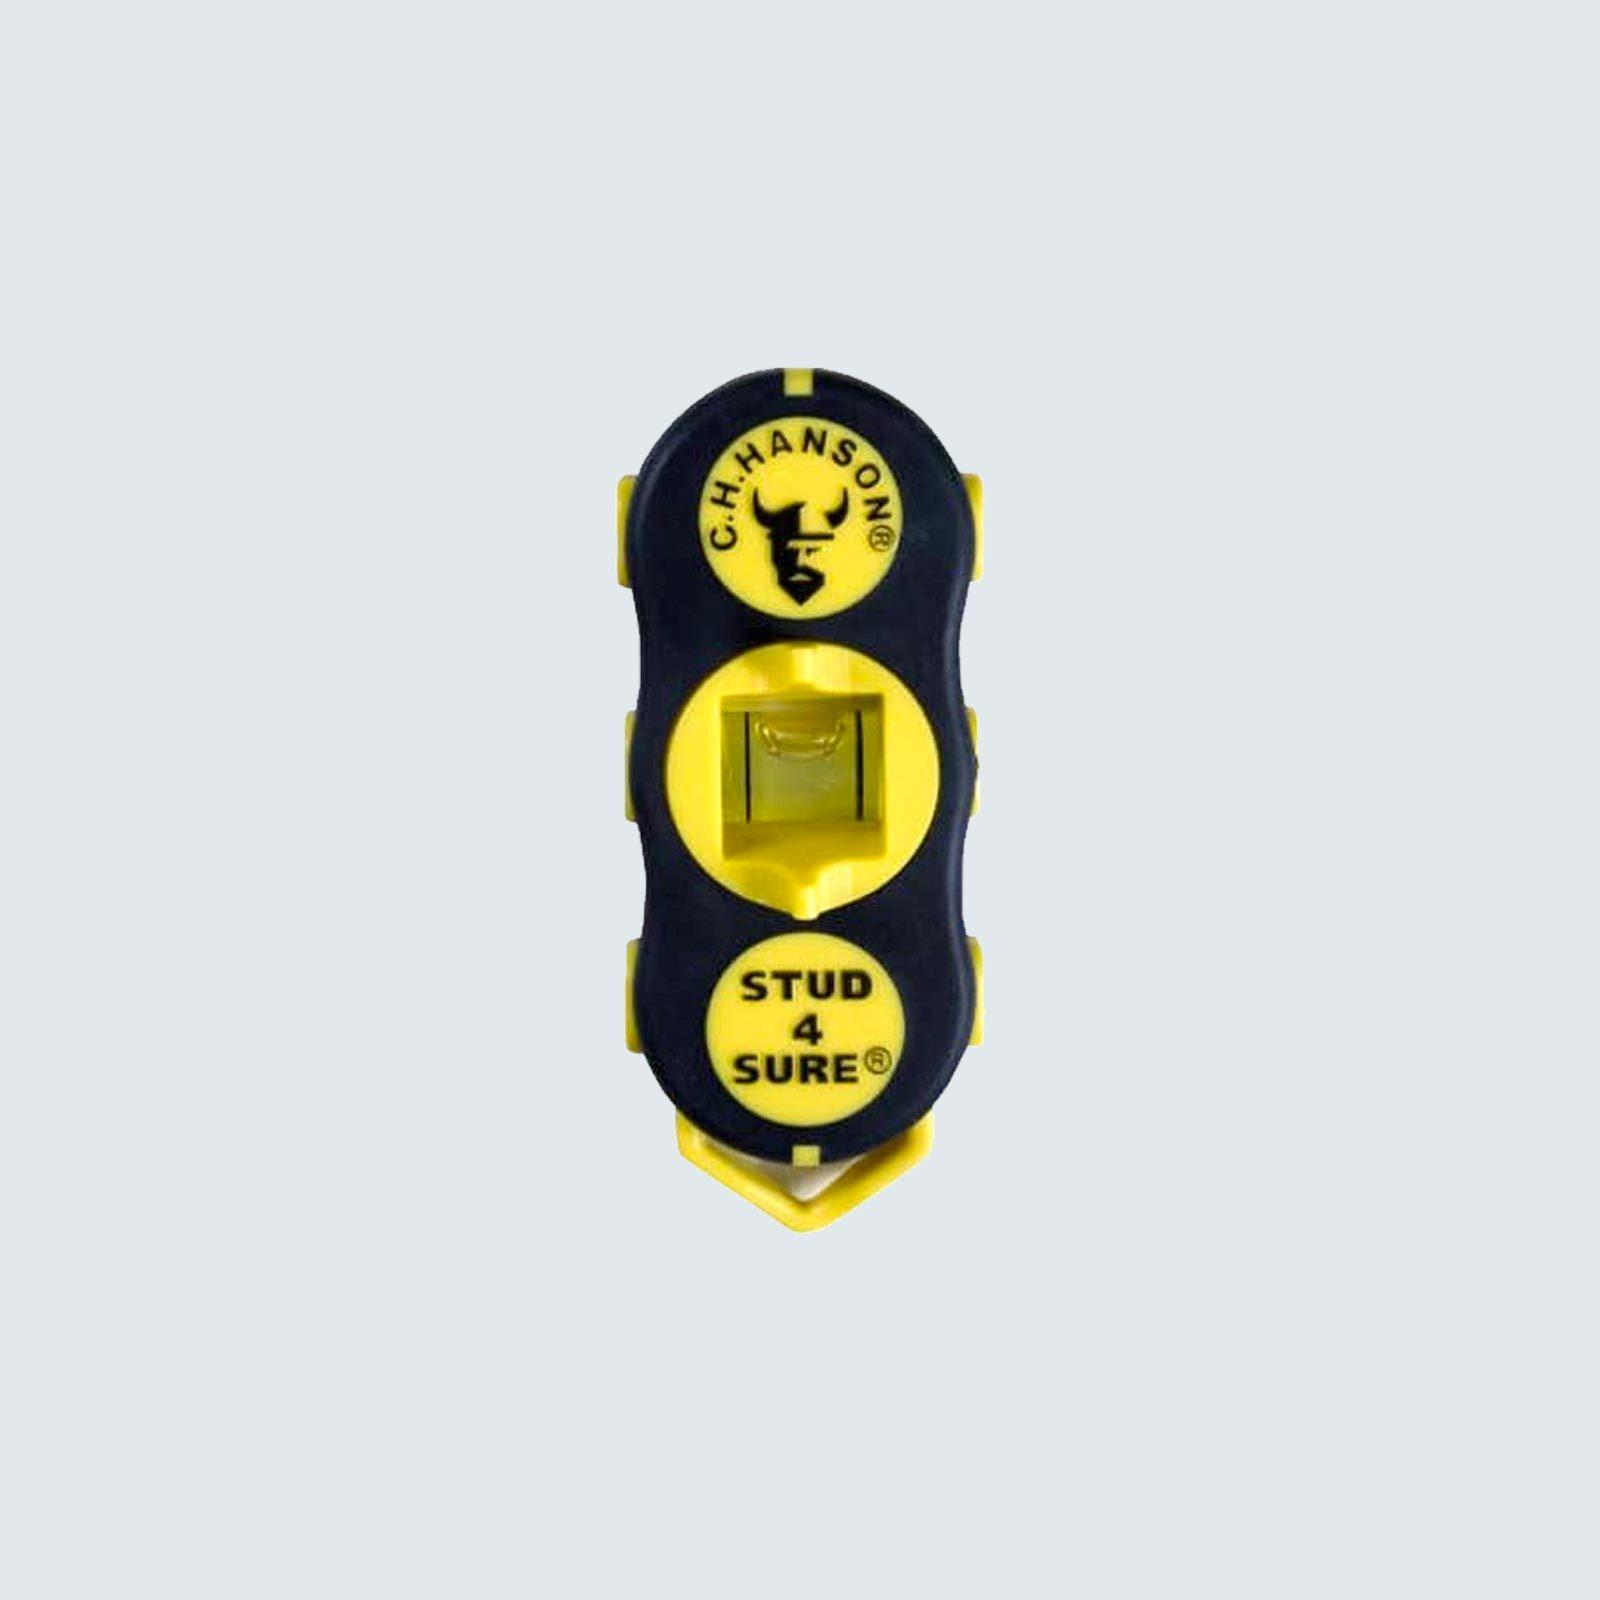 CH Hanson 03040 Magnetic Stud Finder